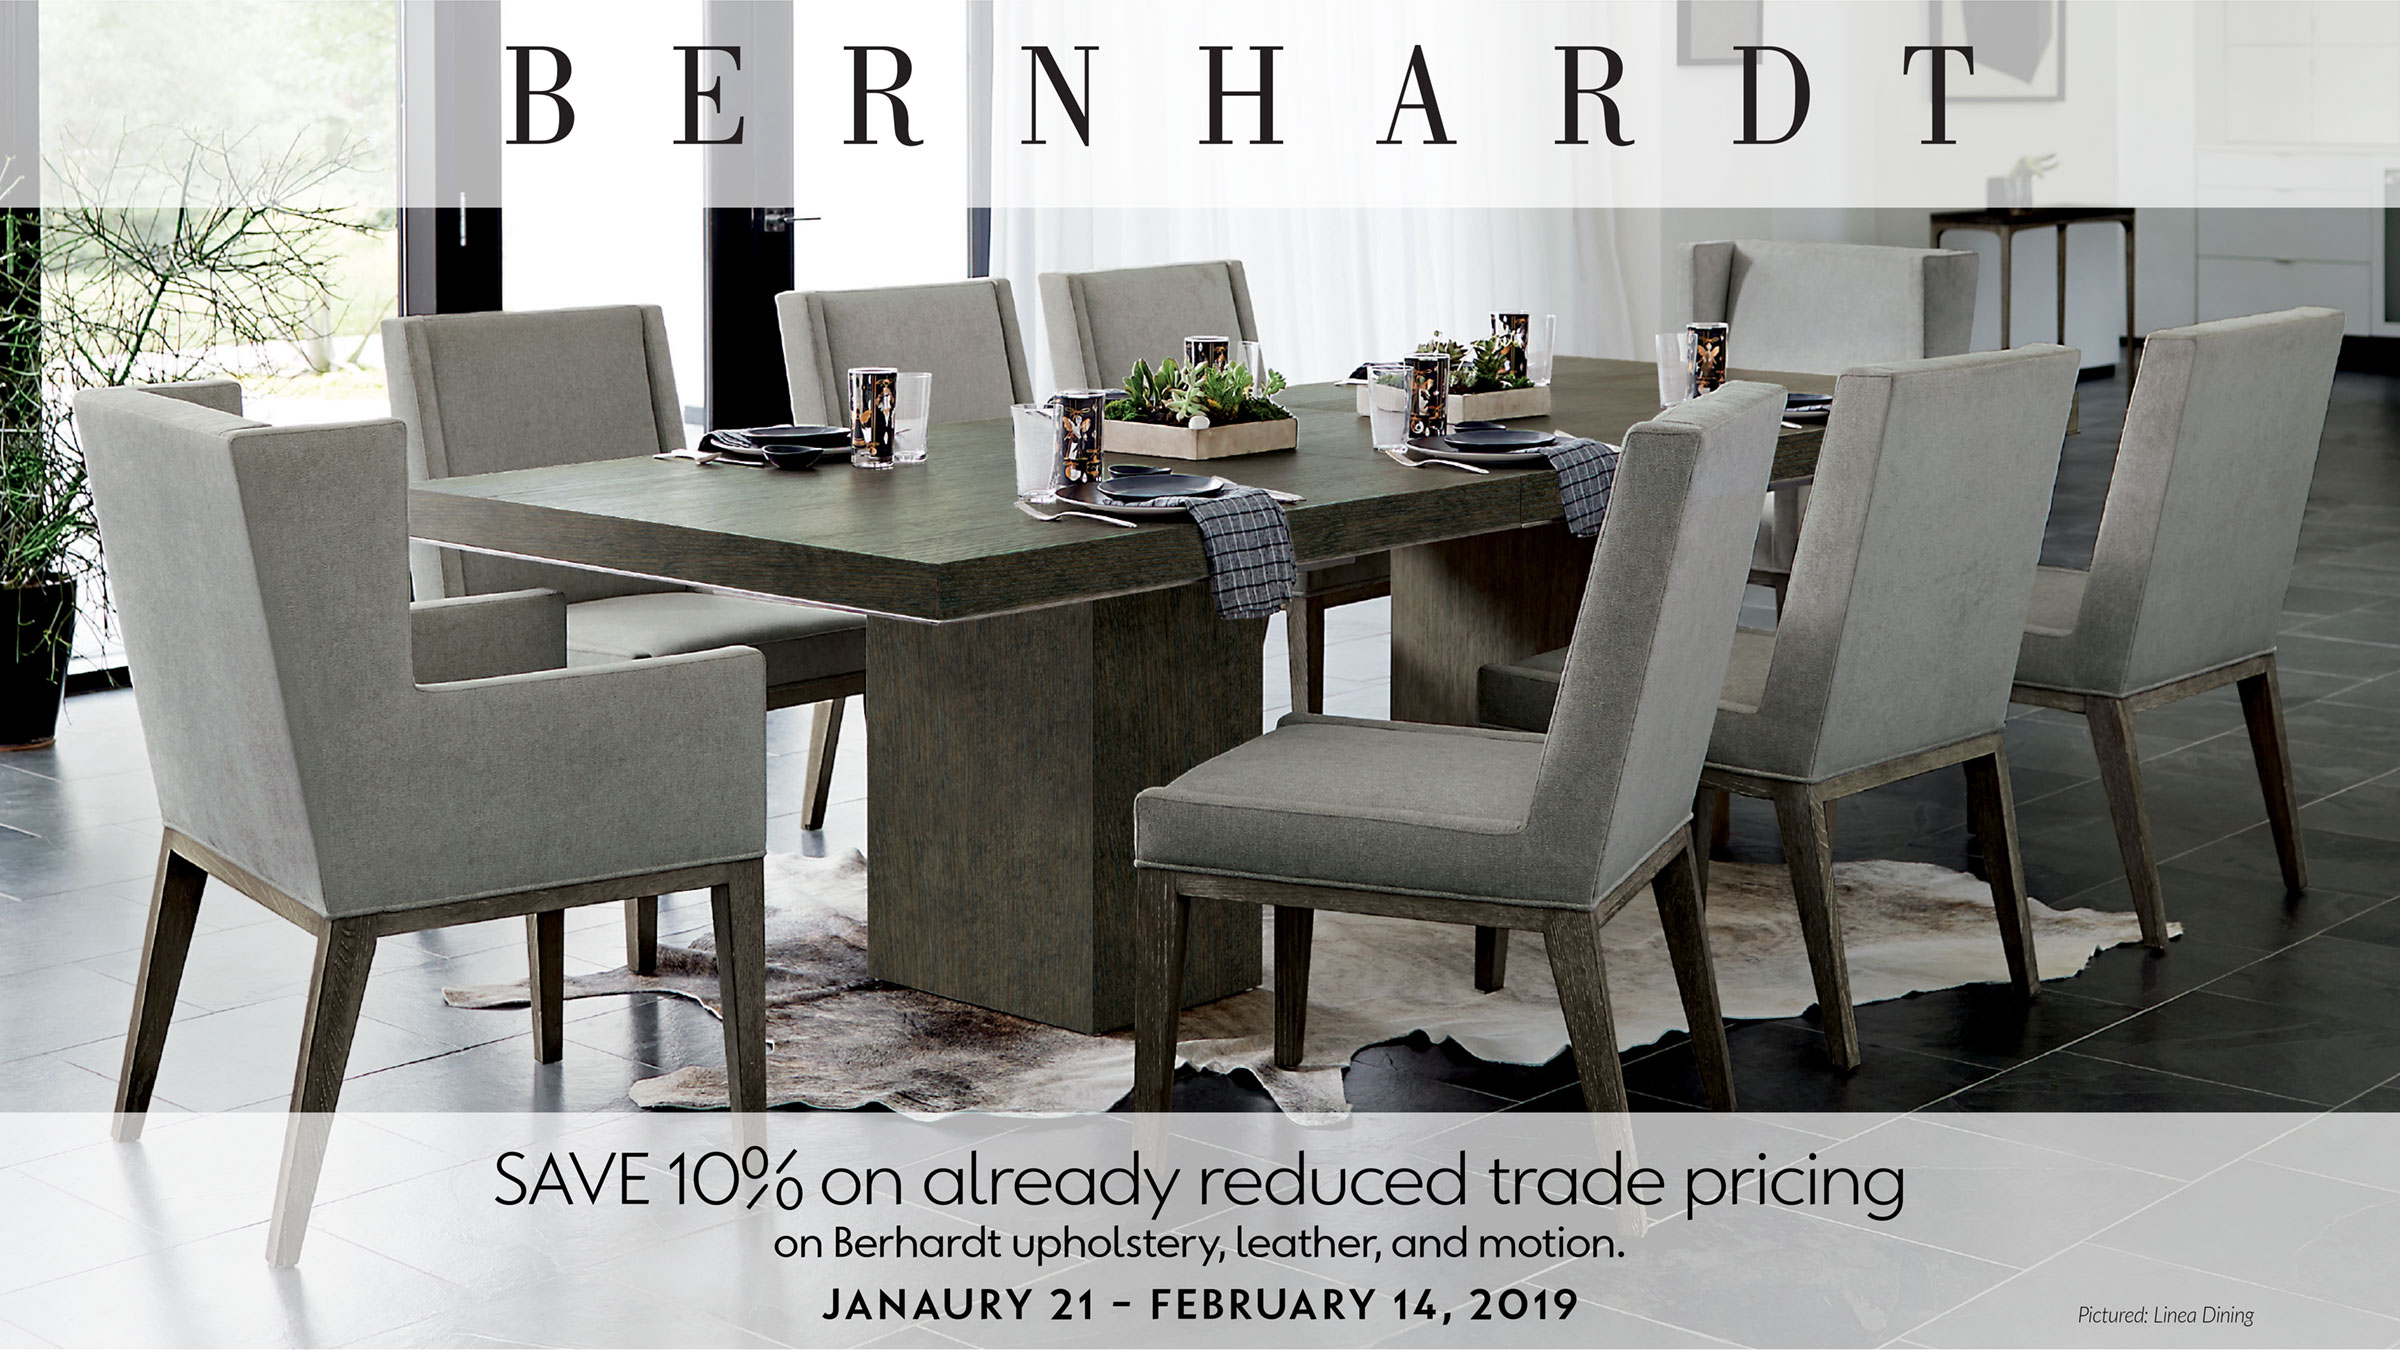 Bernhardt Sale at IDS: January 21 - February 14, 2019